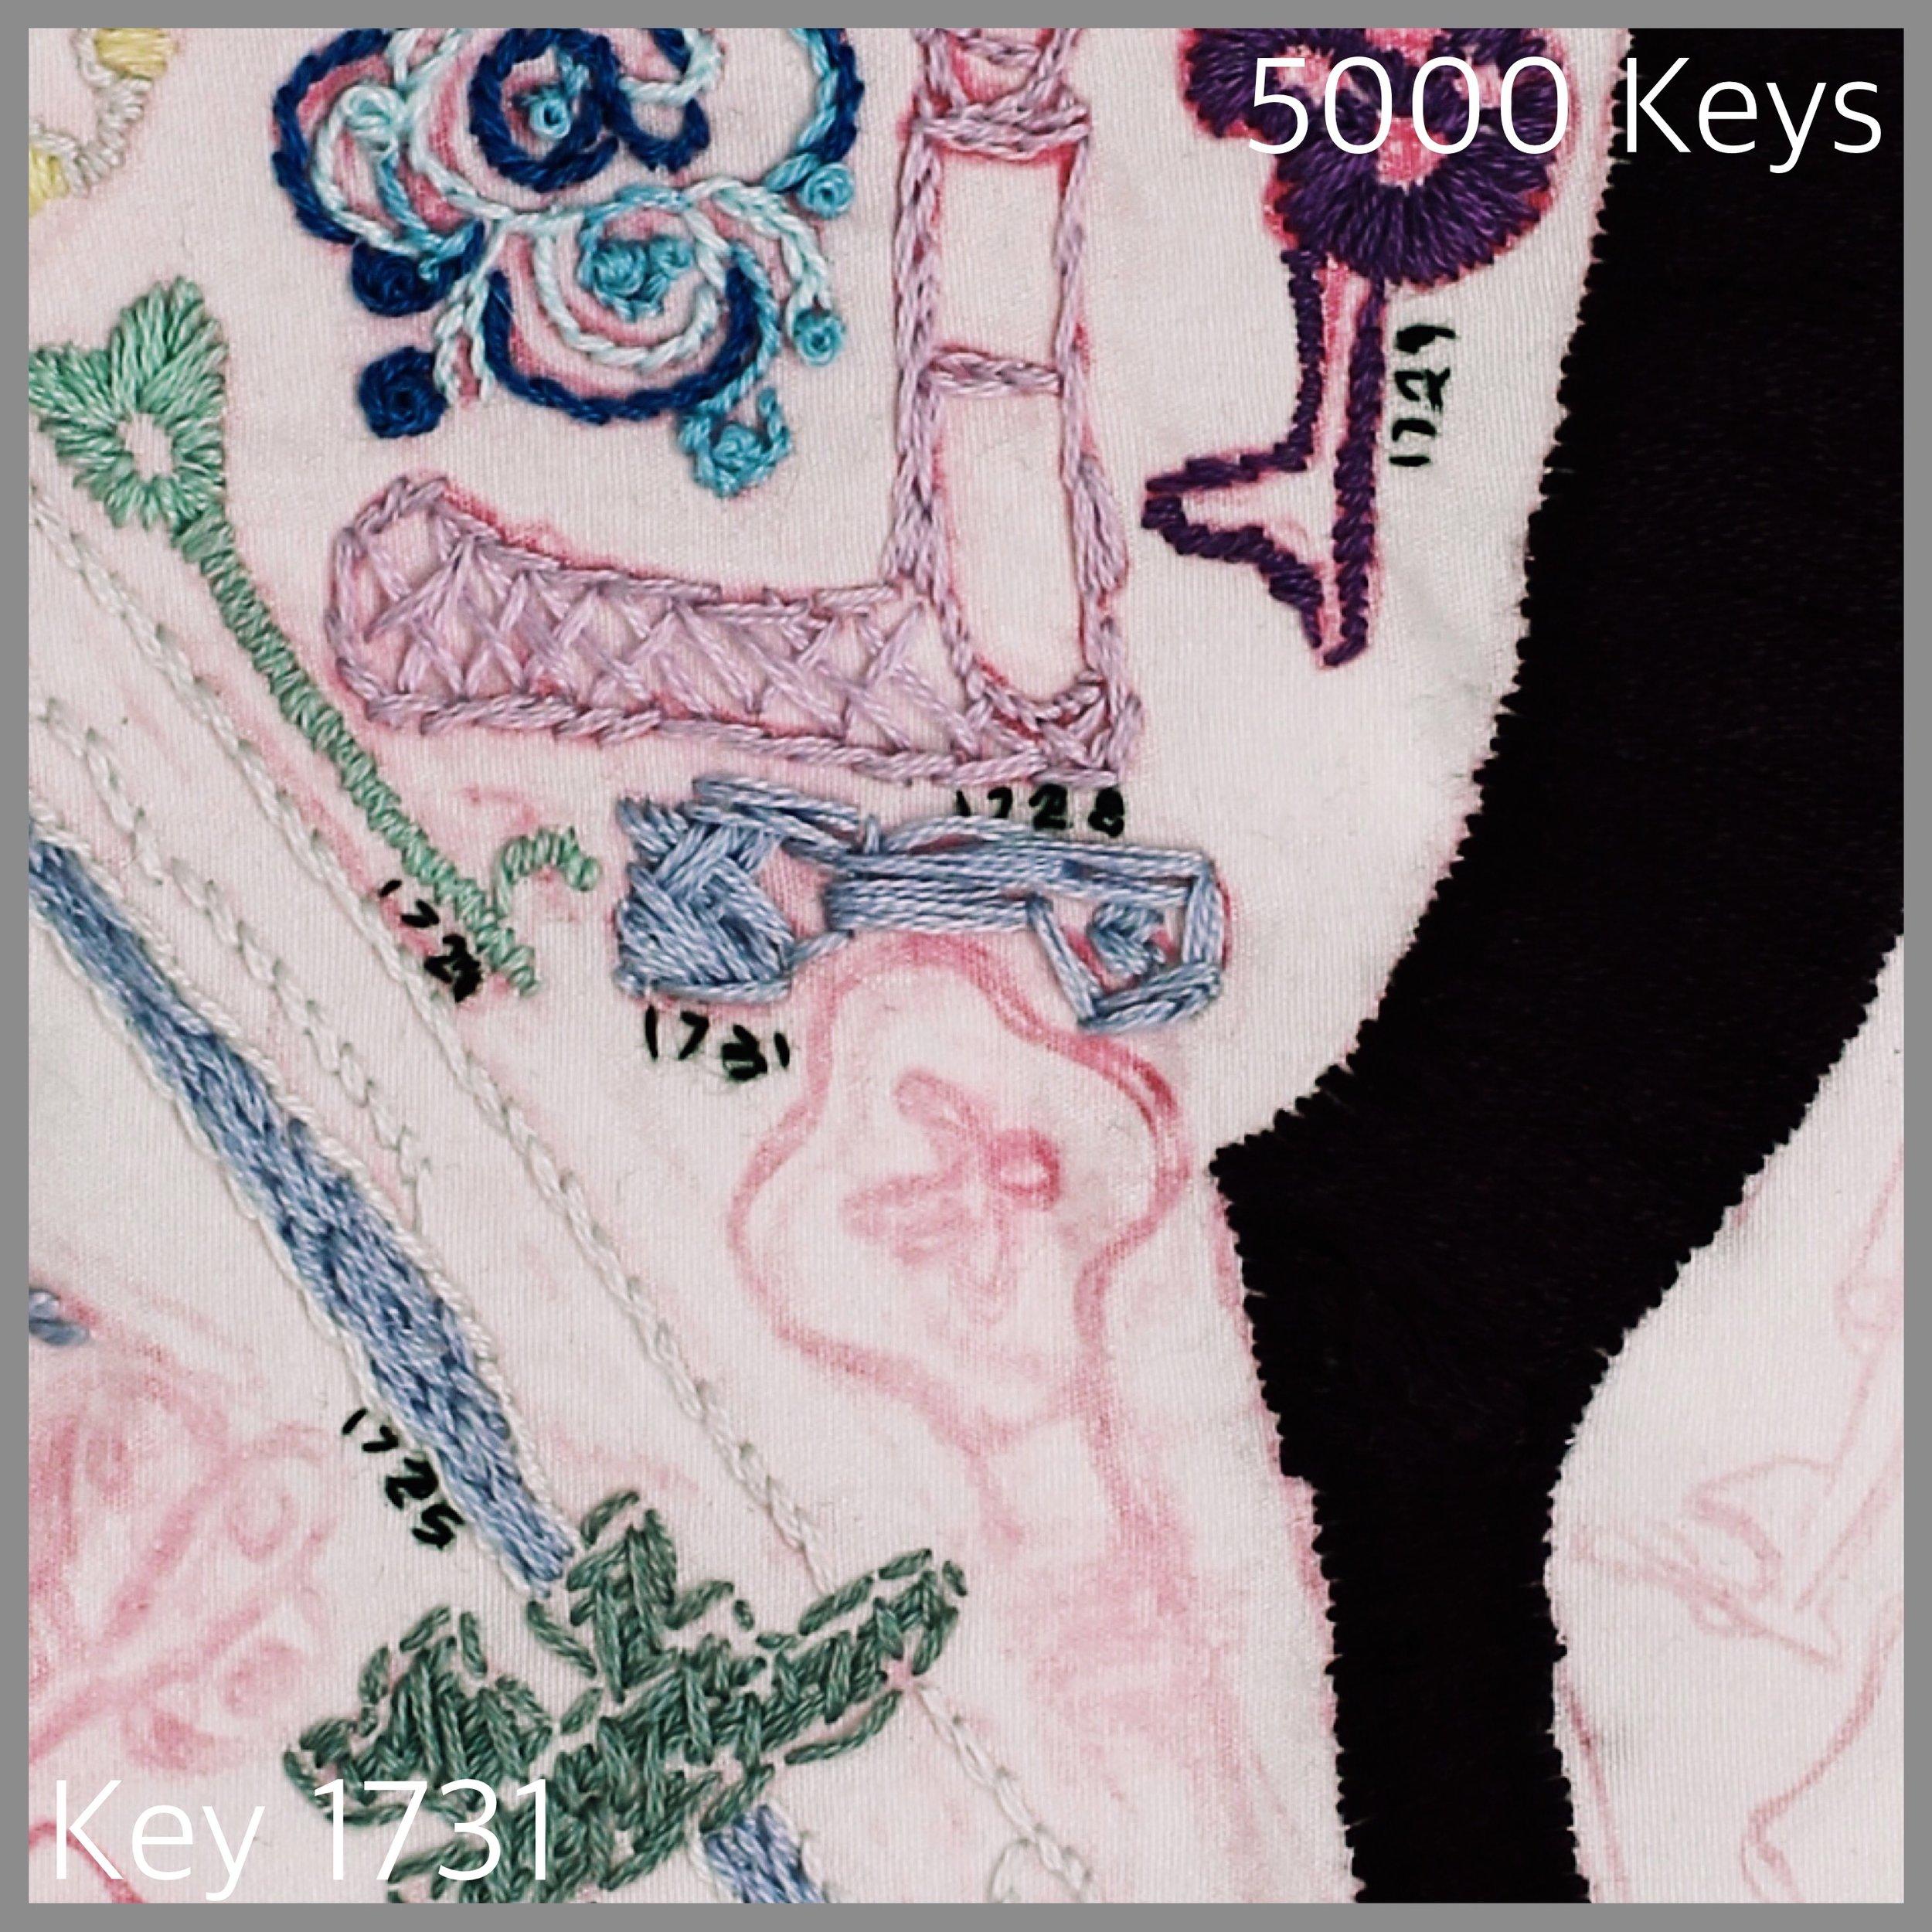 Key 1731 - 1.JPG